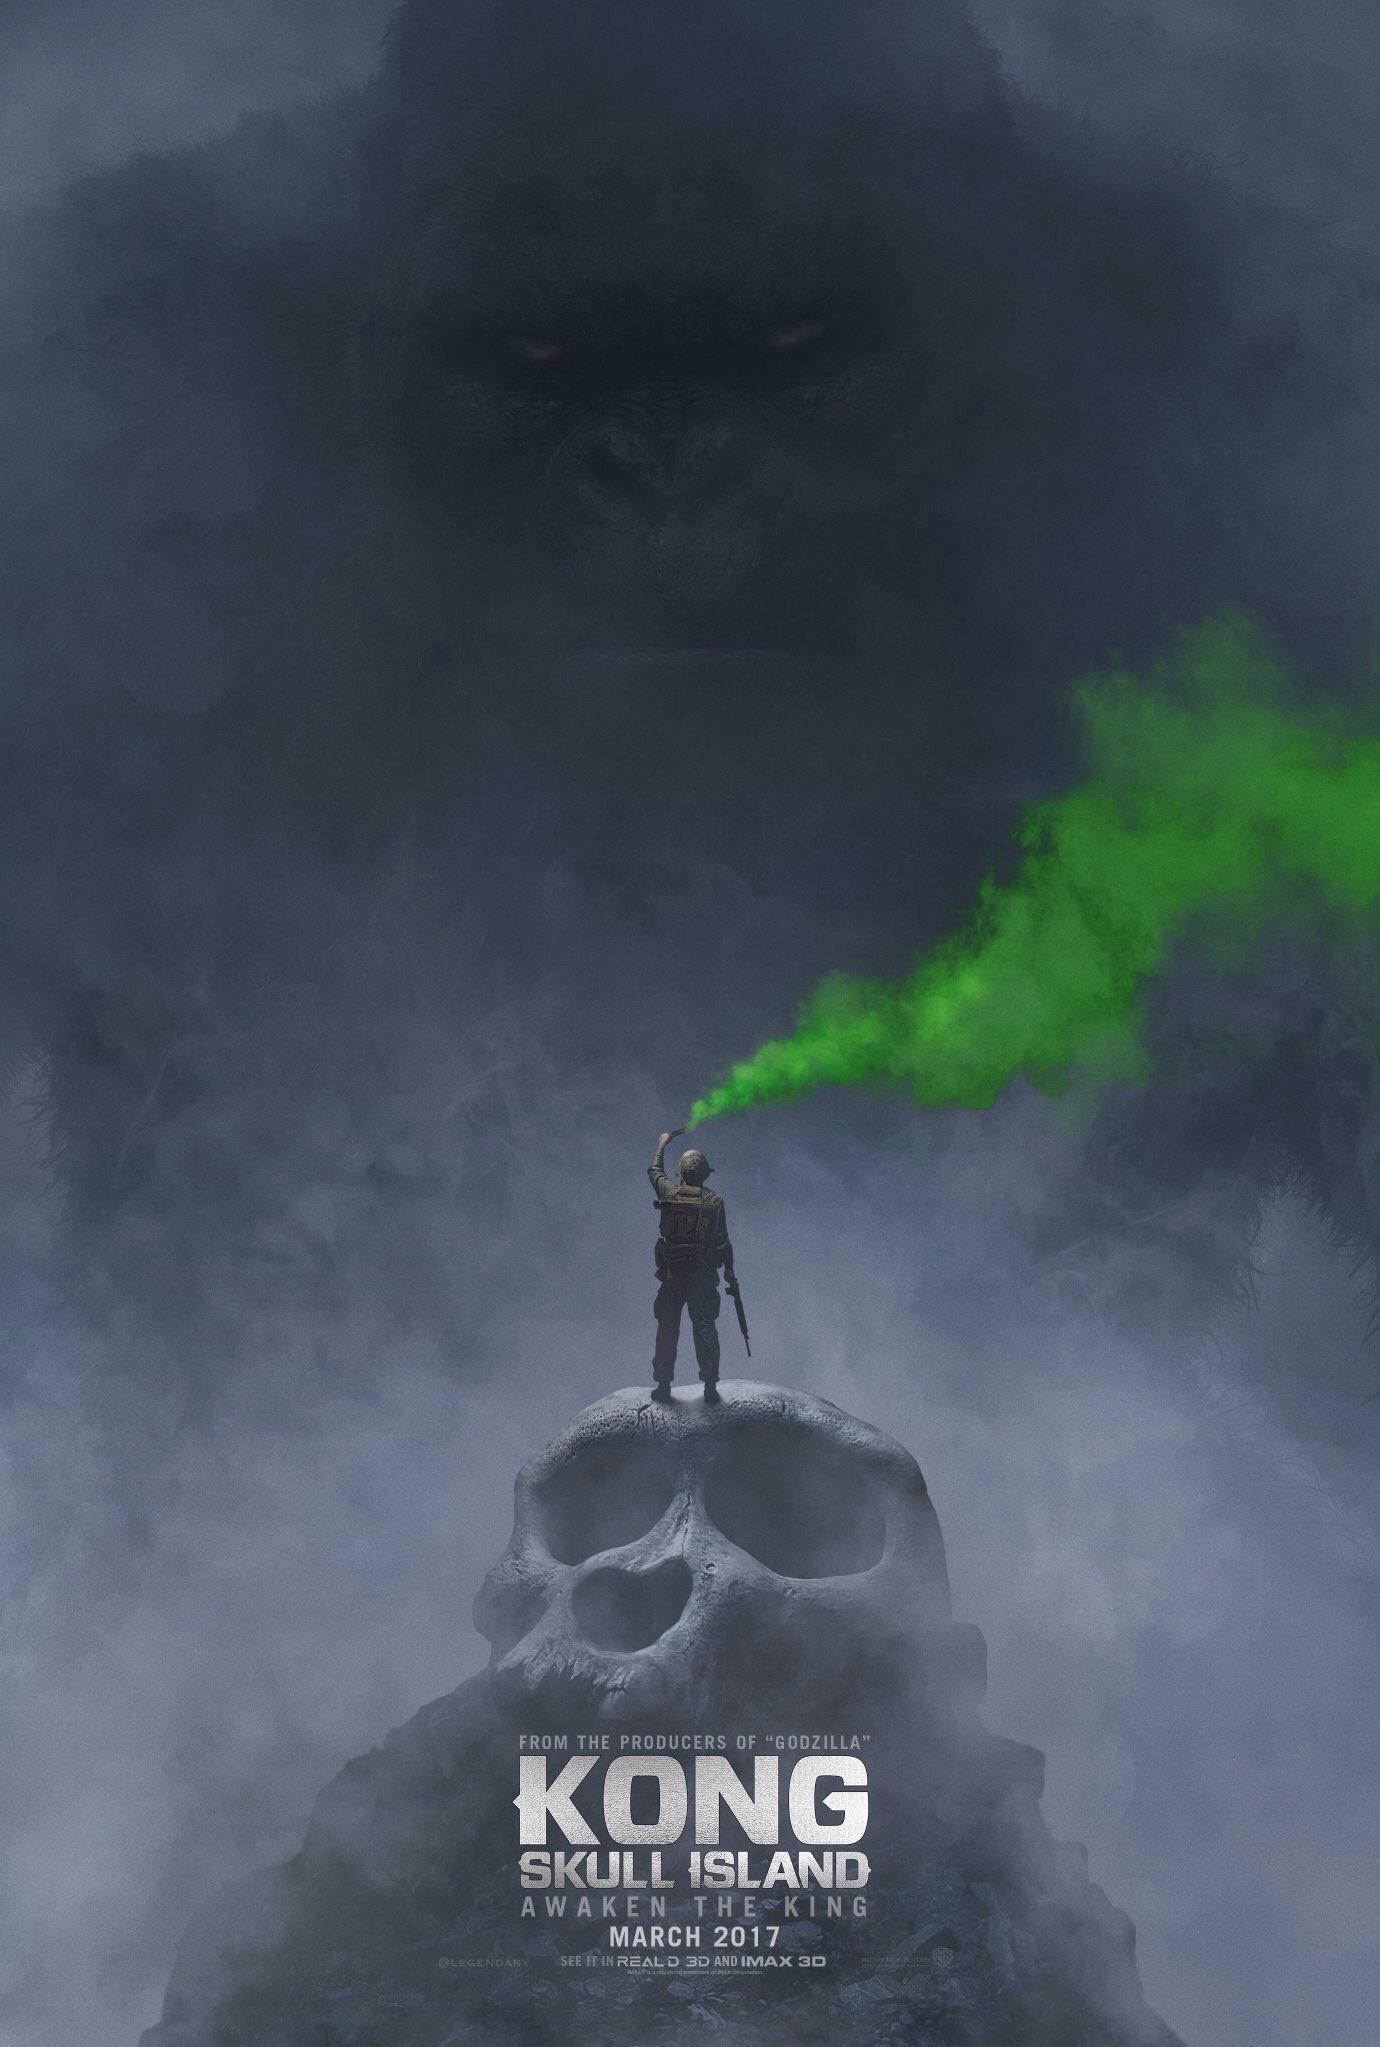 King Kong: Skull Island Awaken the king poster